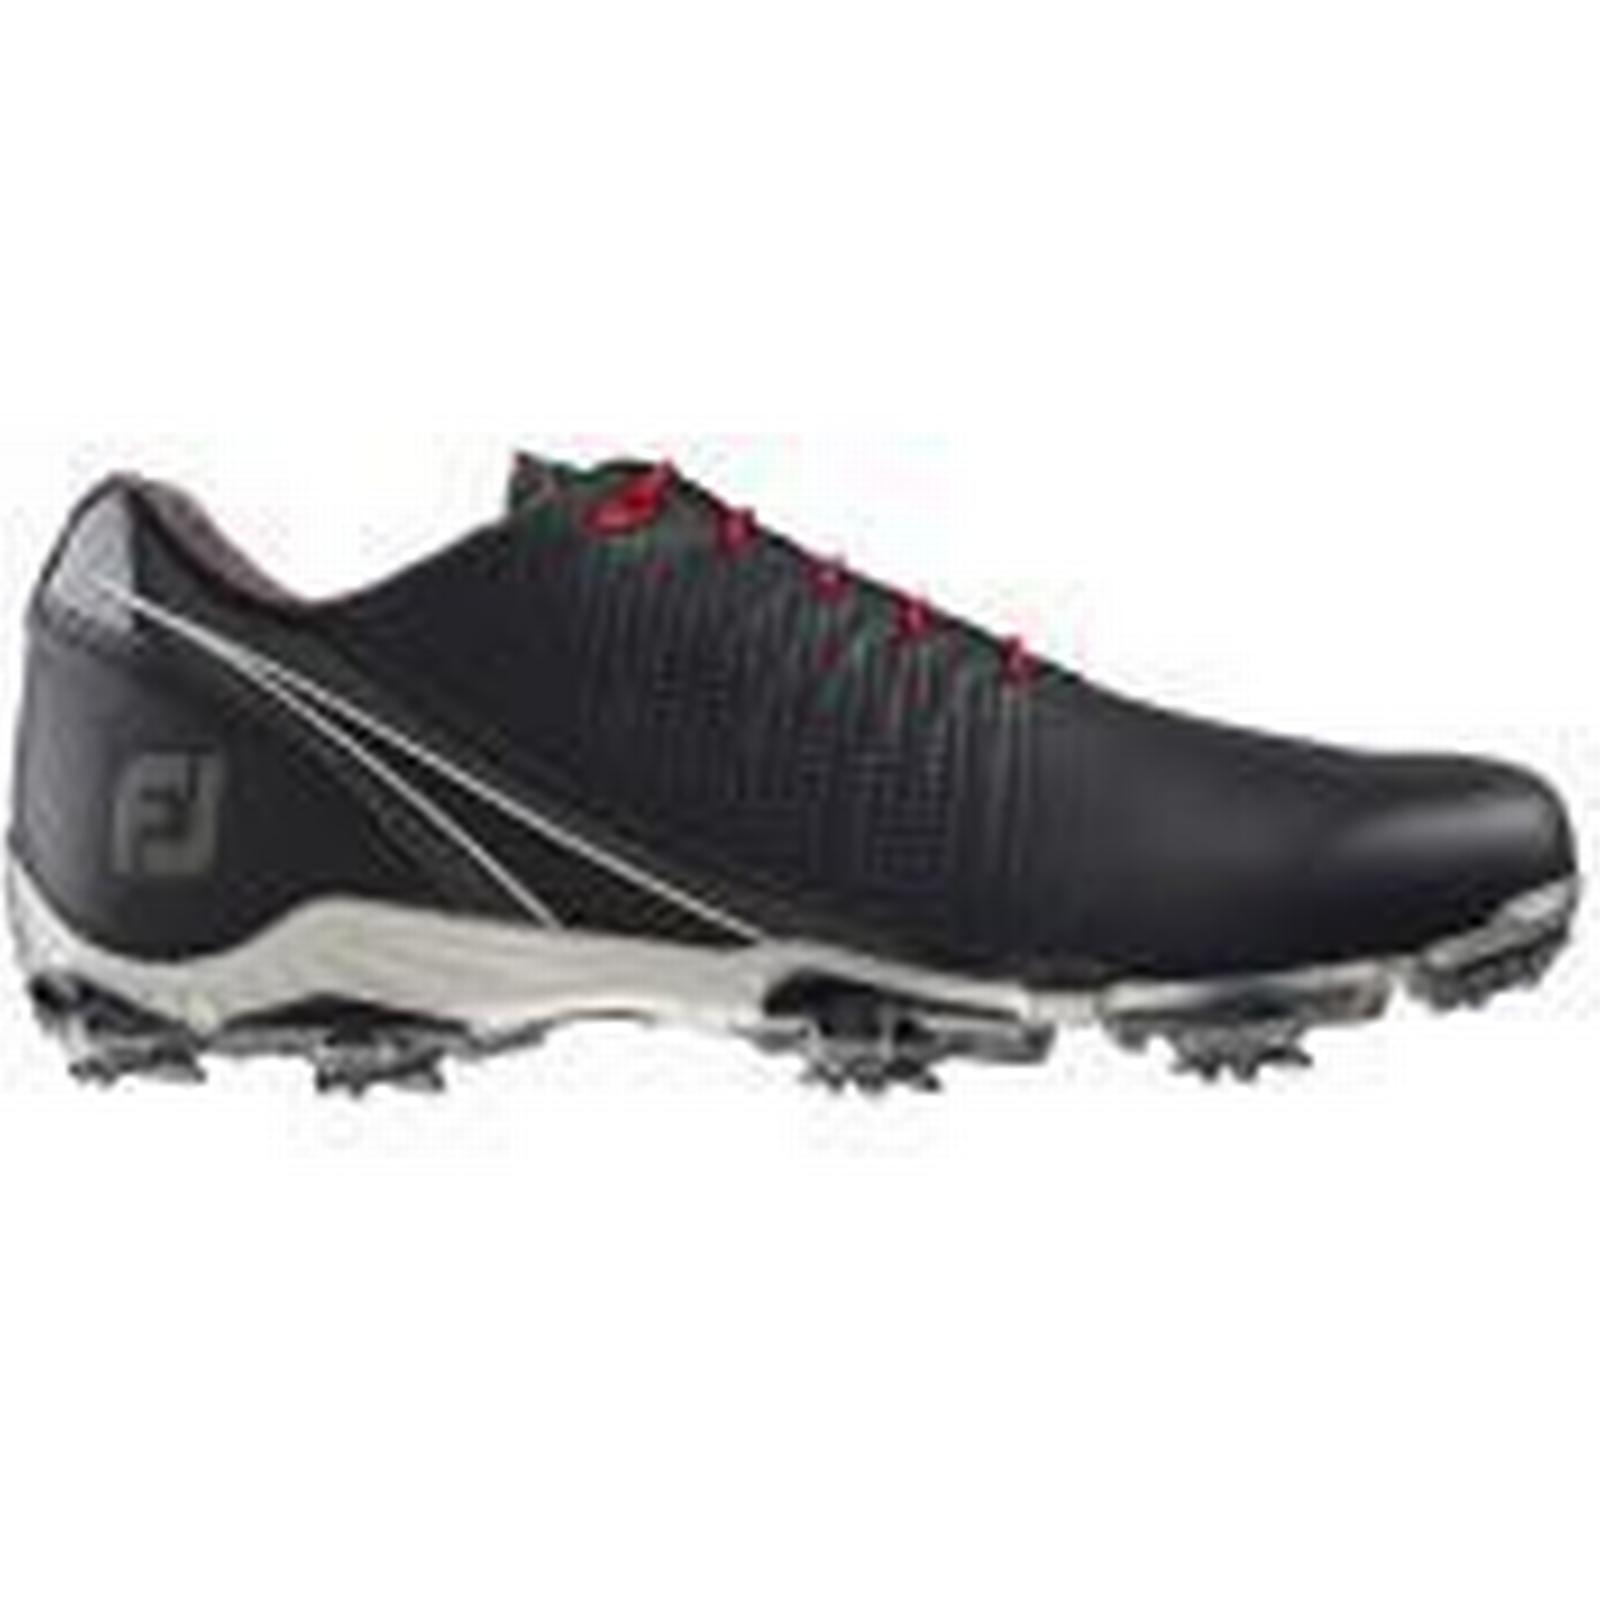 de golf l'adn des chaussures de golf de - noir 4c1002